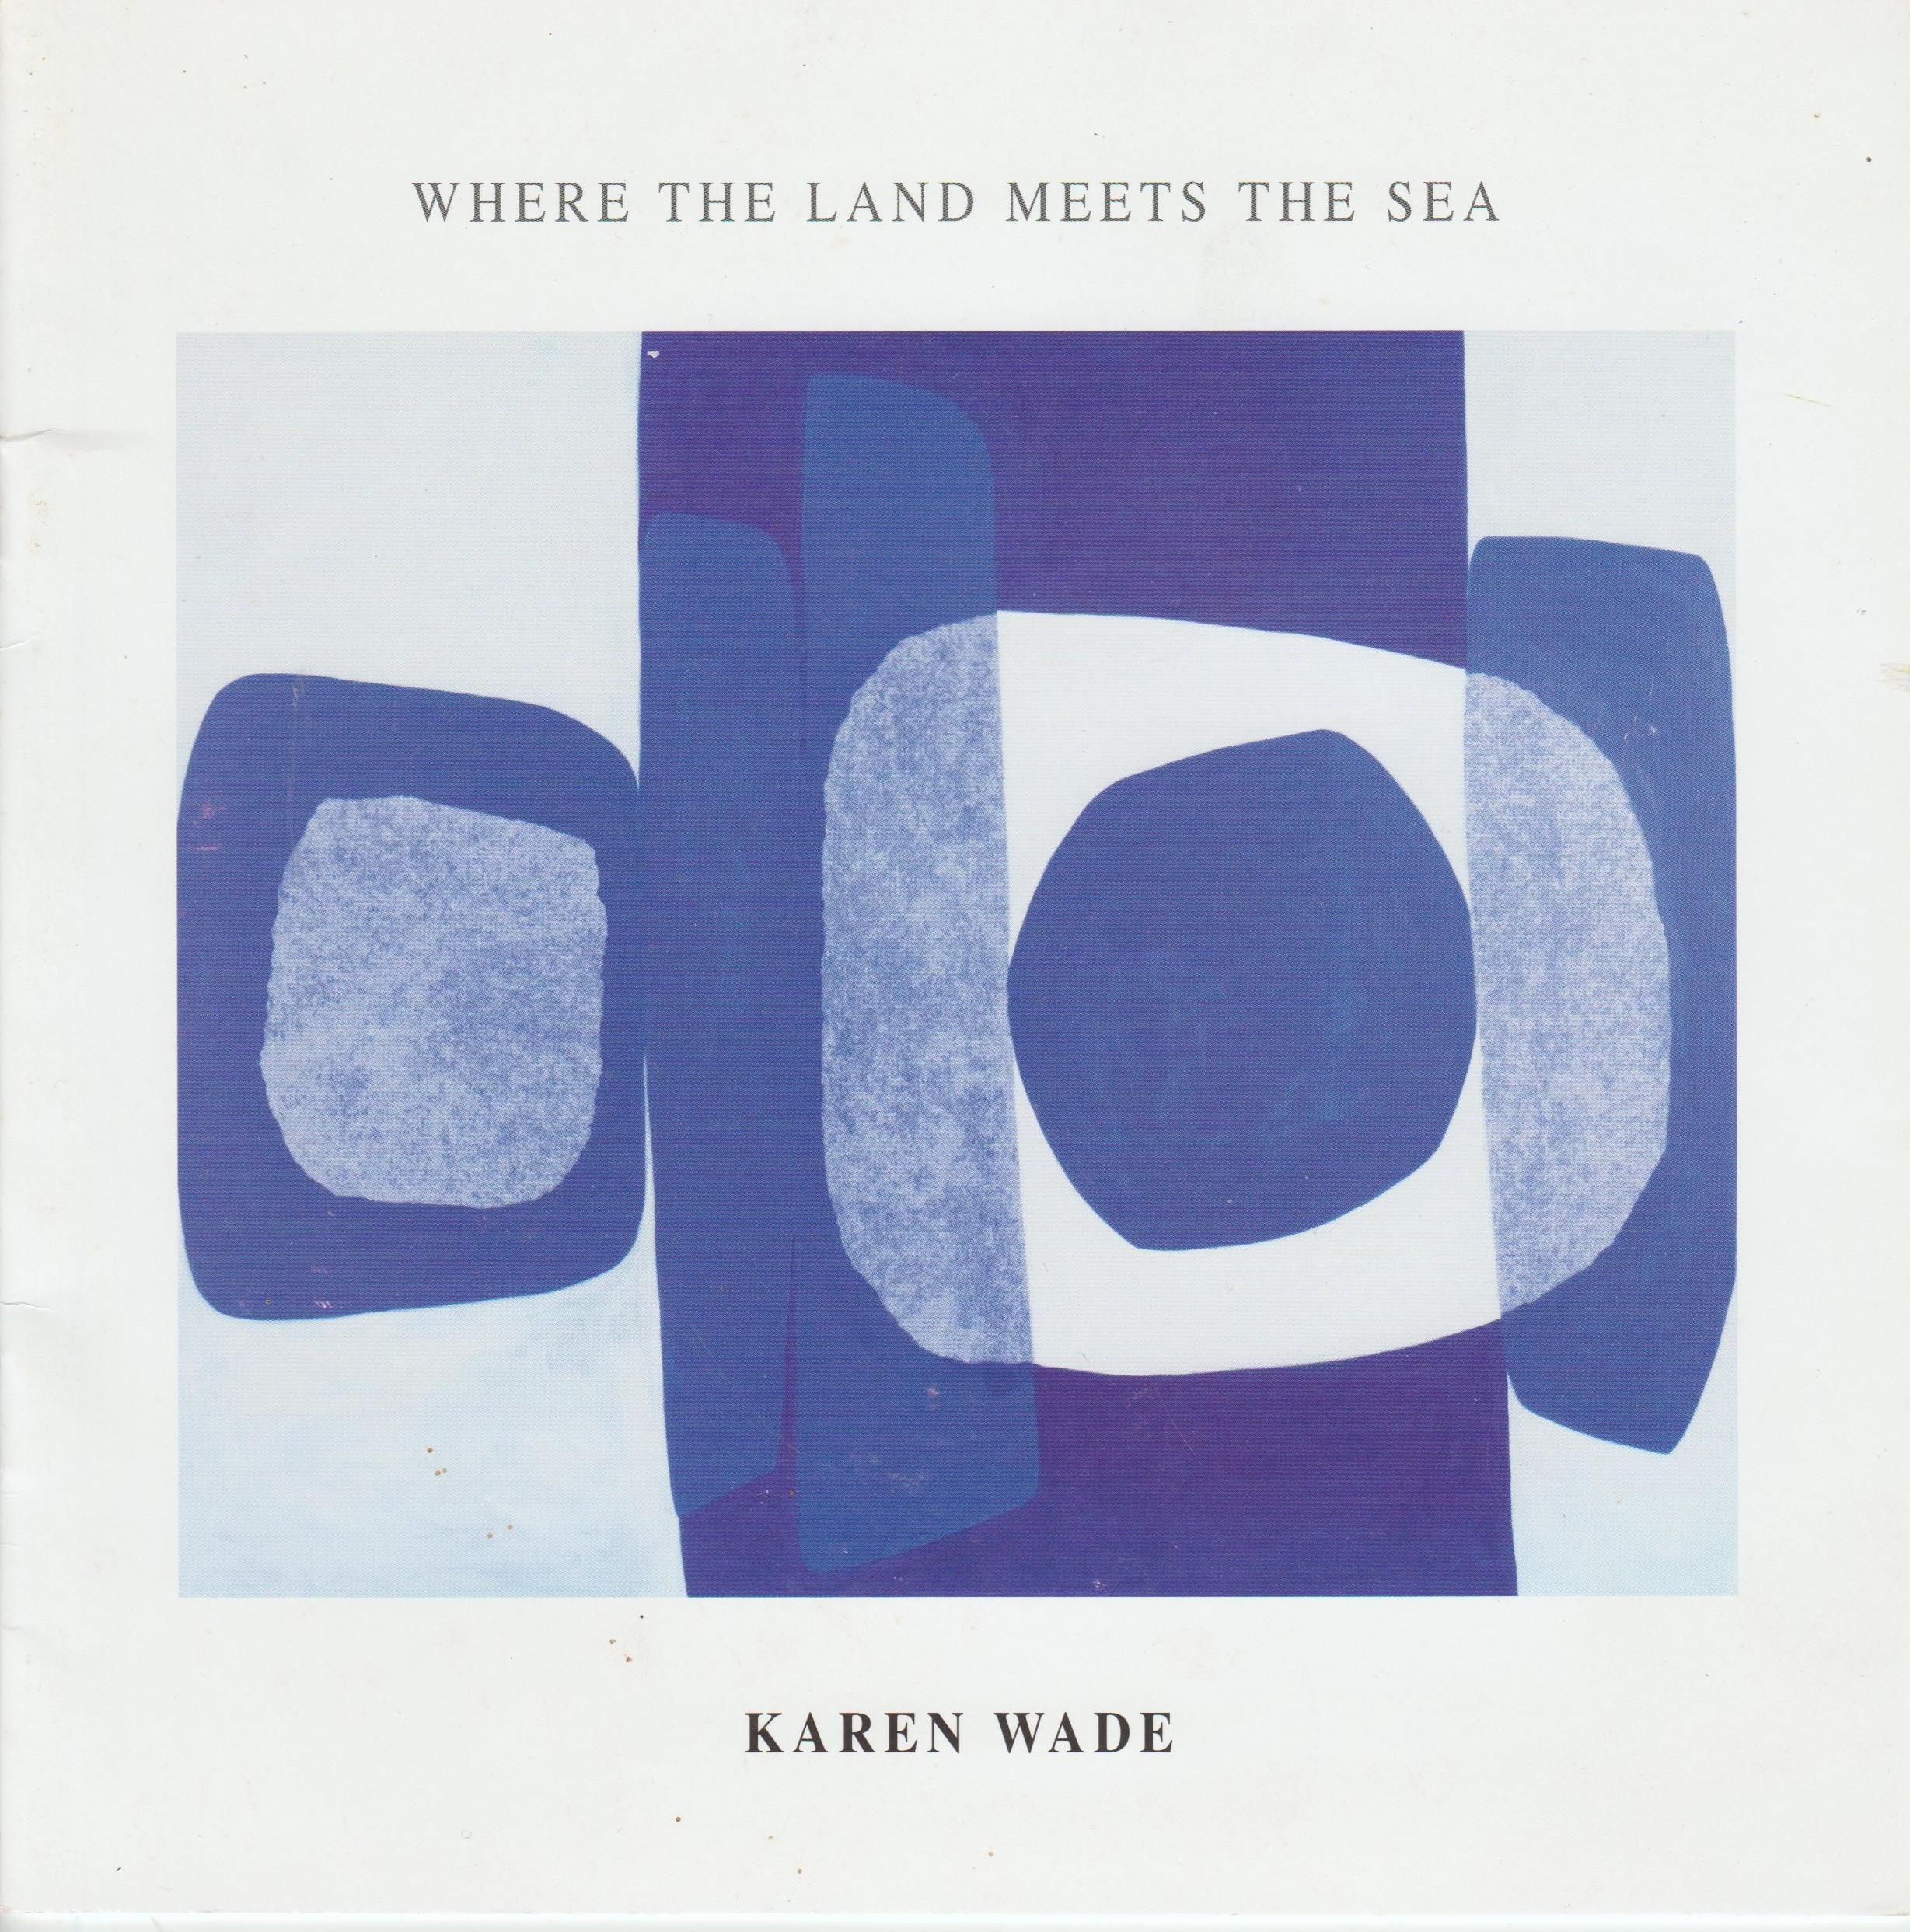 Where the Land Meets the Sea, Burford, 2006